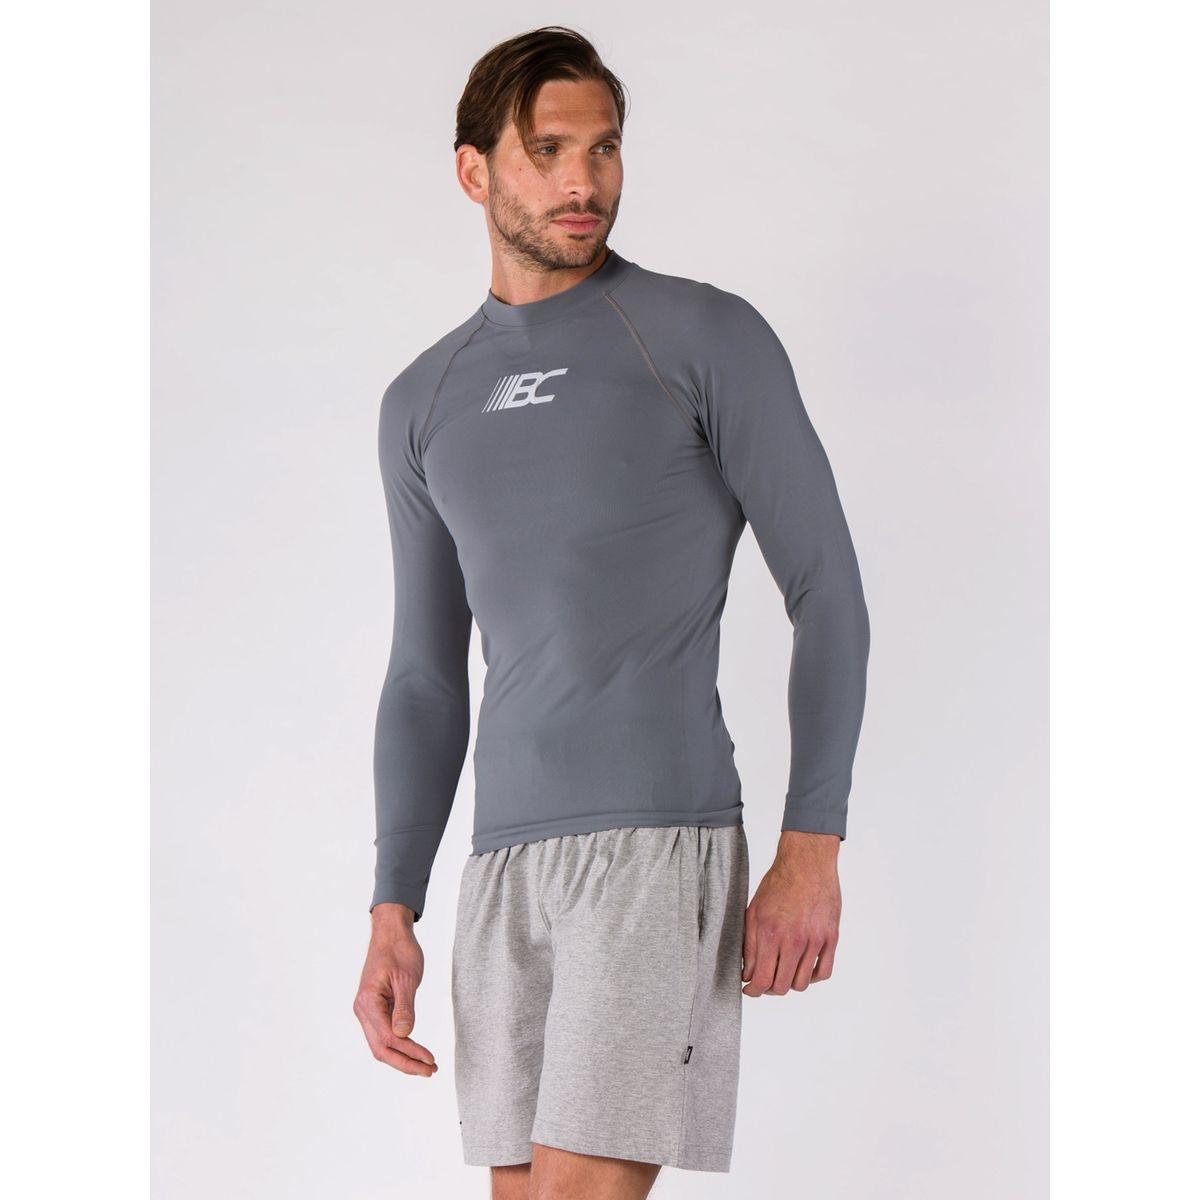 T-shirt compression DARIUS